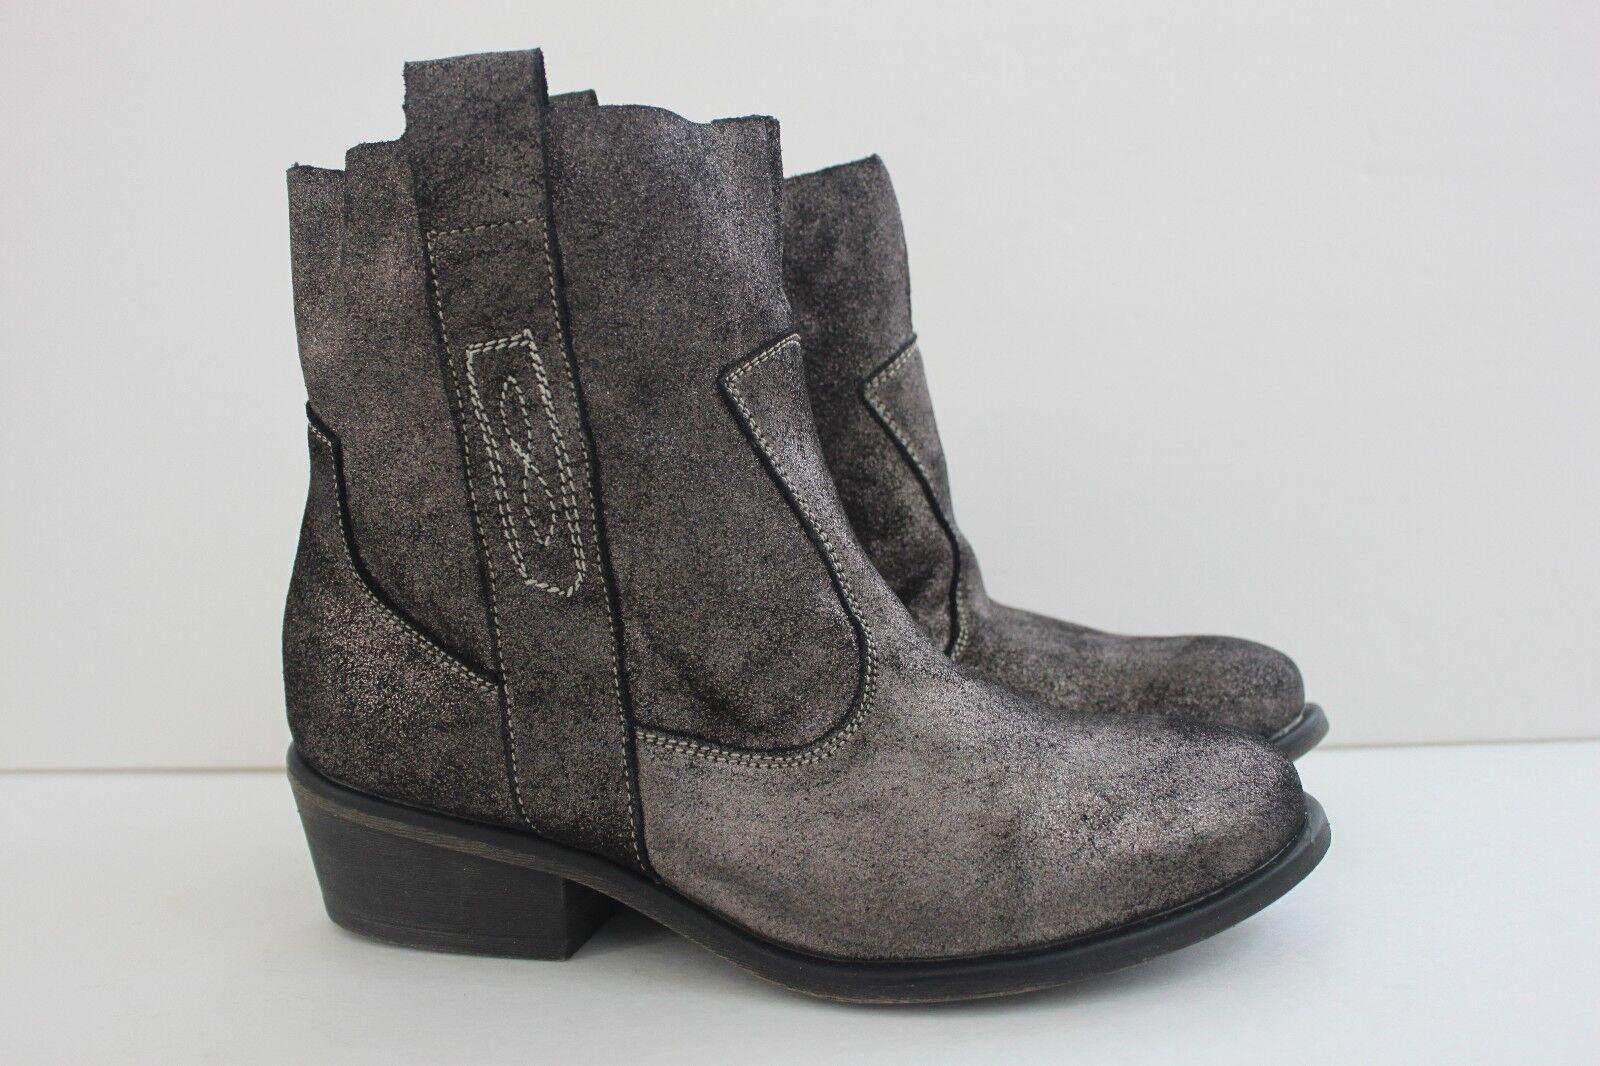 Charles By Charles David Shoe Size 7.5 M Pewter Metallic Leather Boot Womens NIB